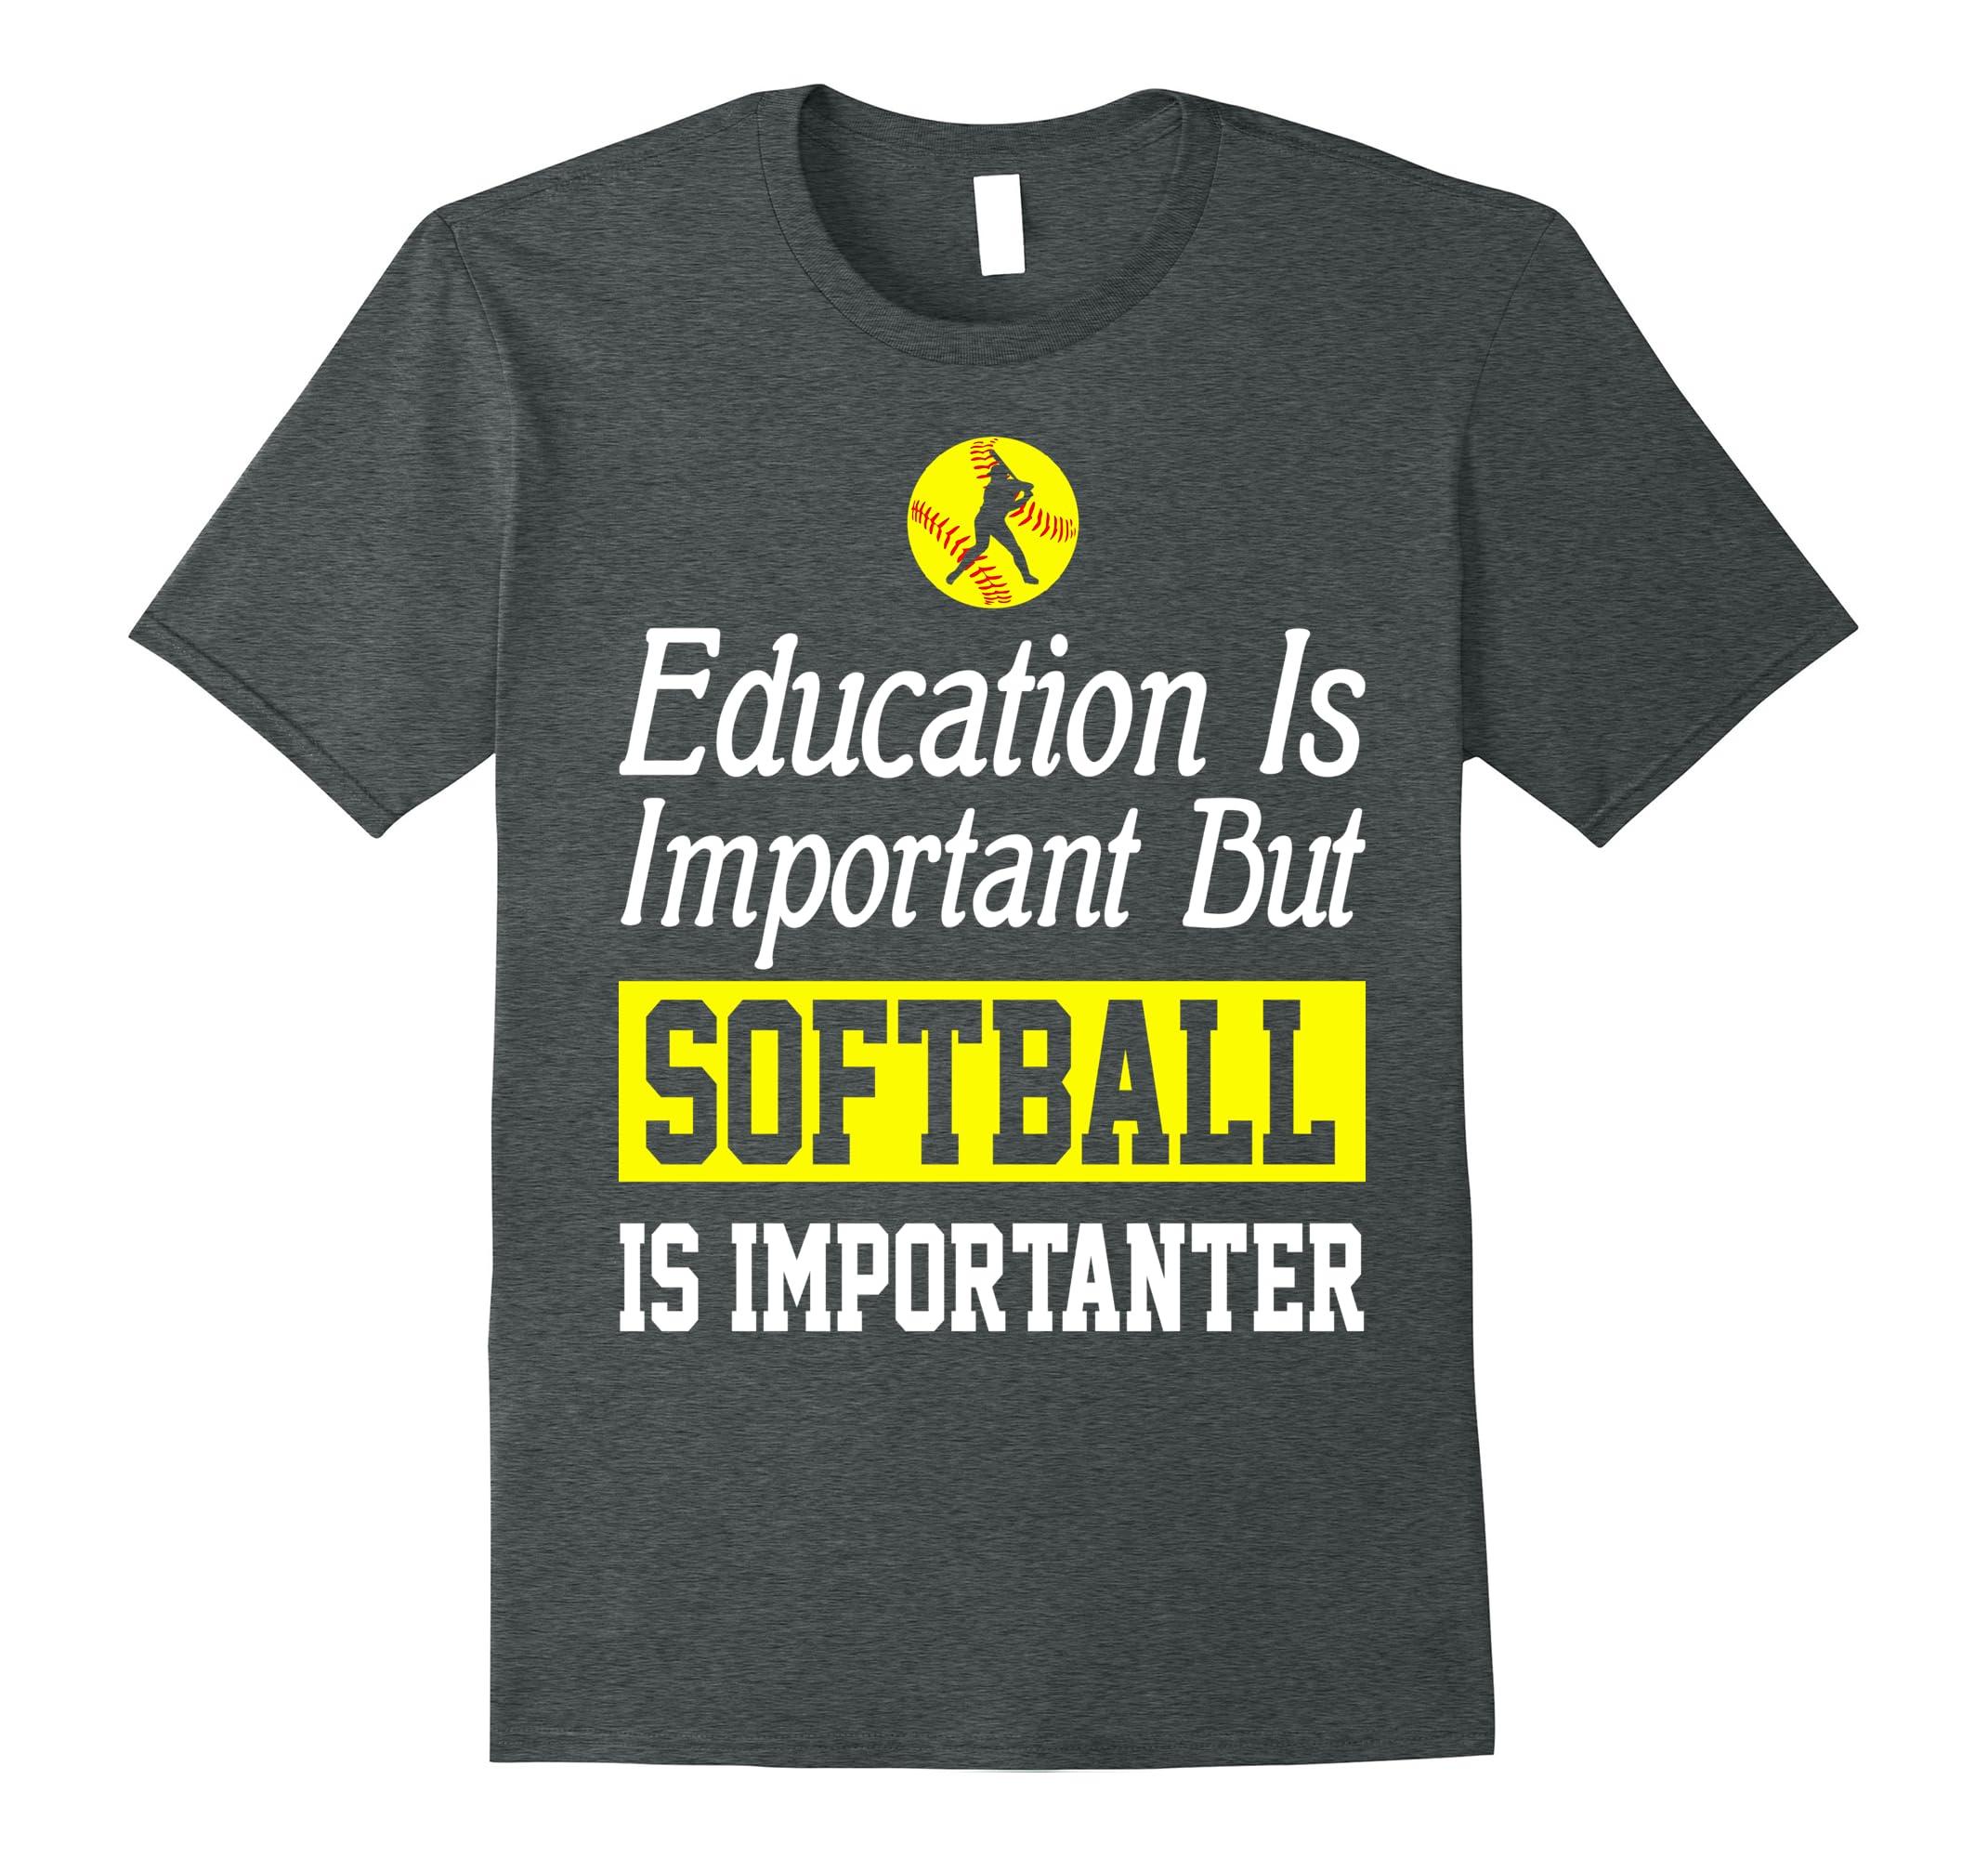 Education Important Softball Importanter Shirt-Colonhue